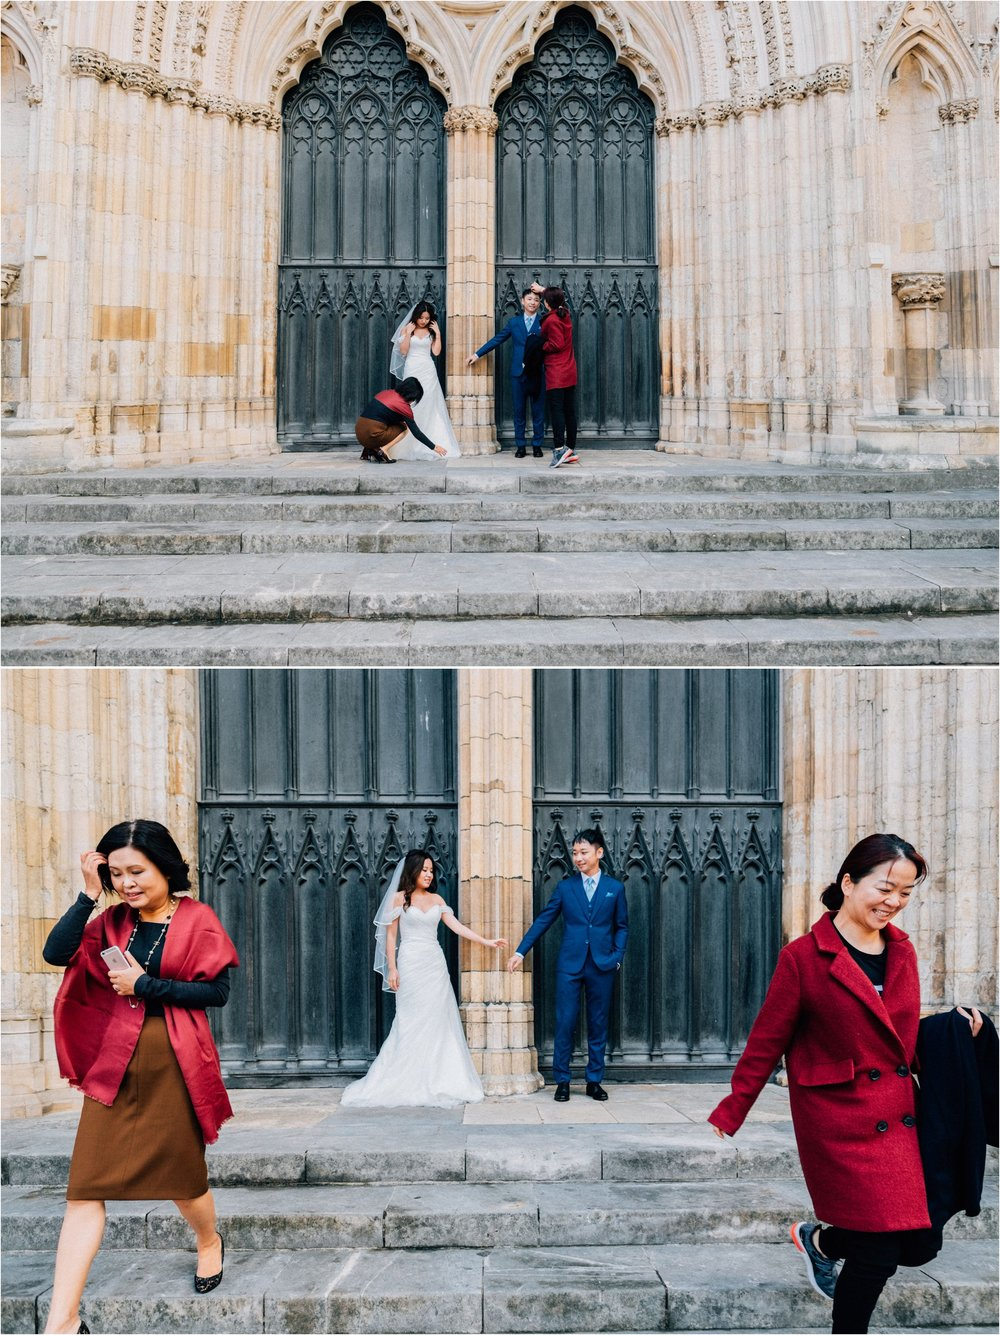 York city elopement wedding photographer_0119.jpg